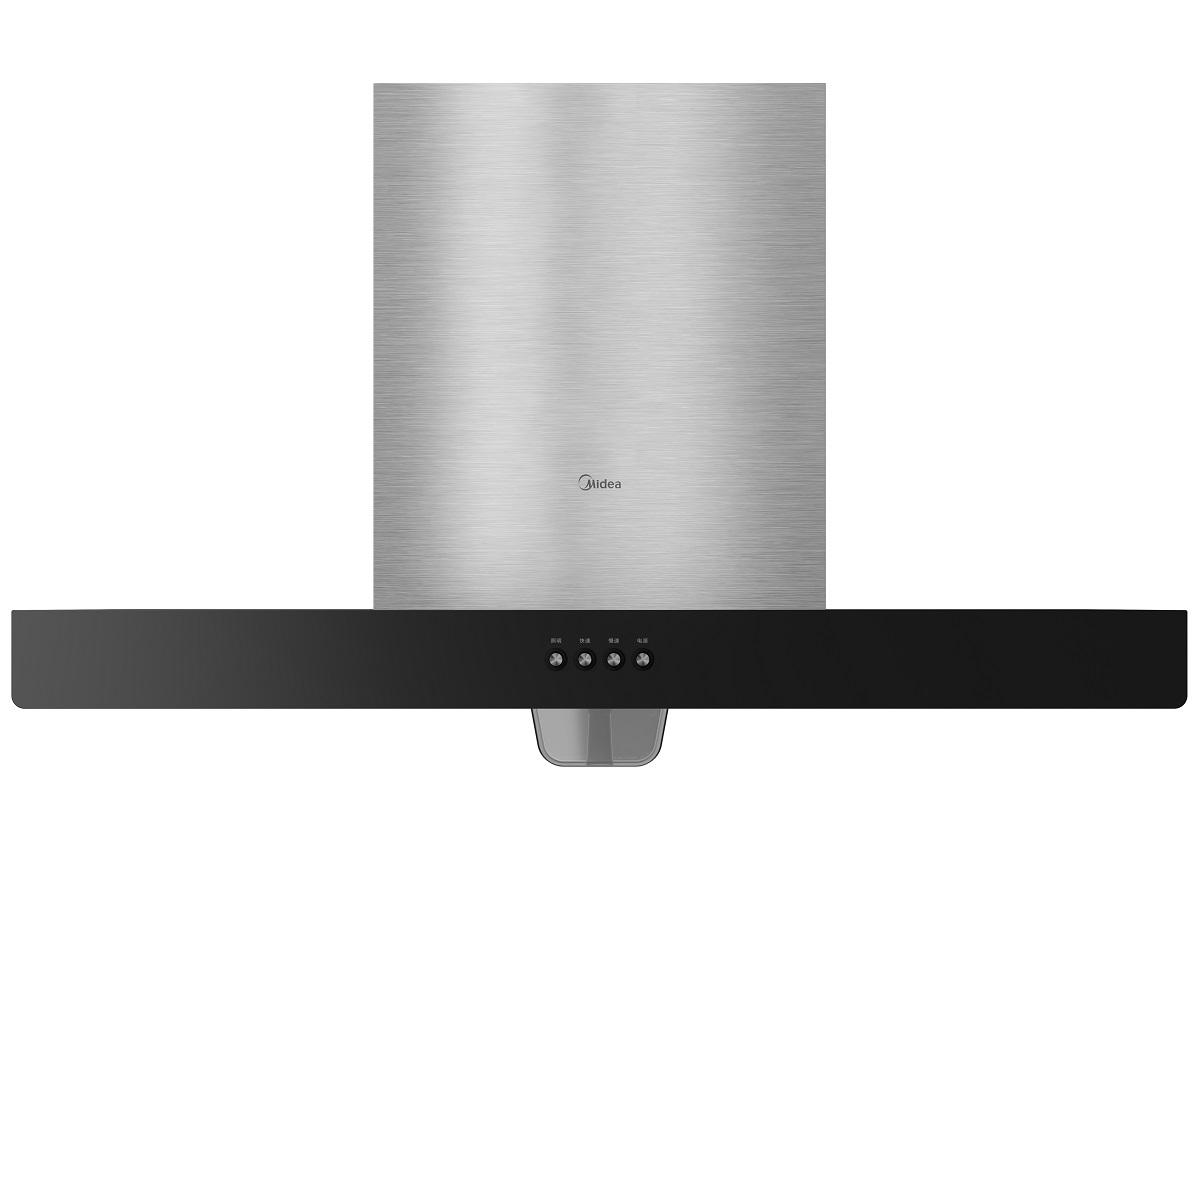 Midea/美的 CXW-220-B81吸油烟机(油烟机) 说明书.pdf